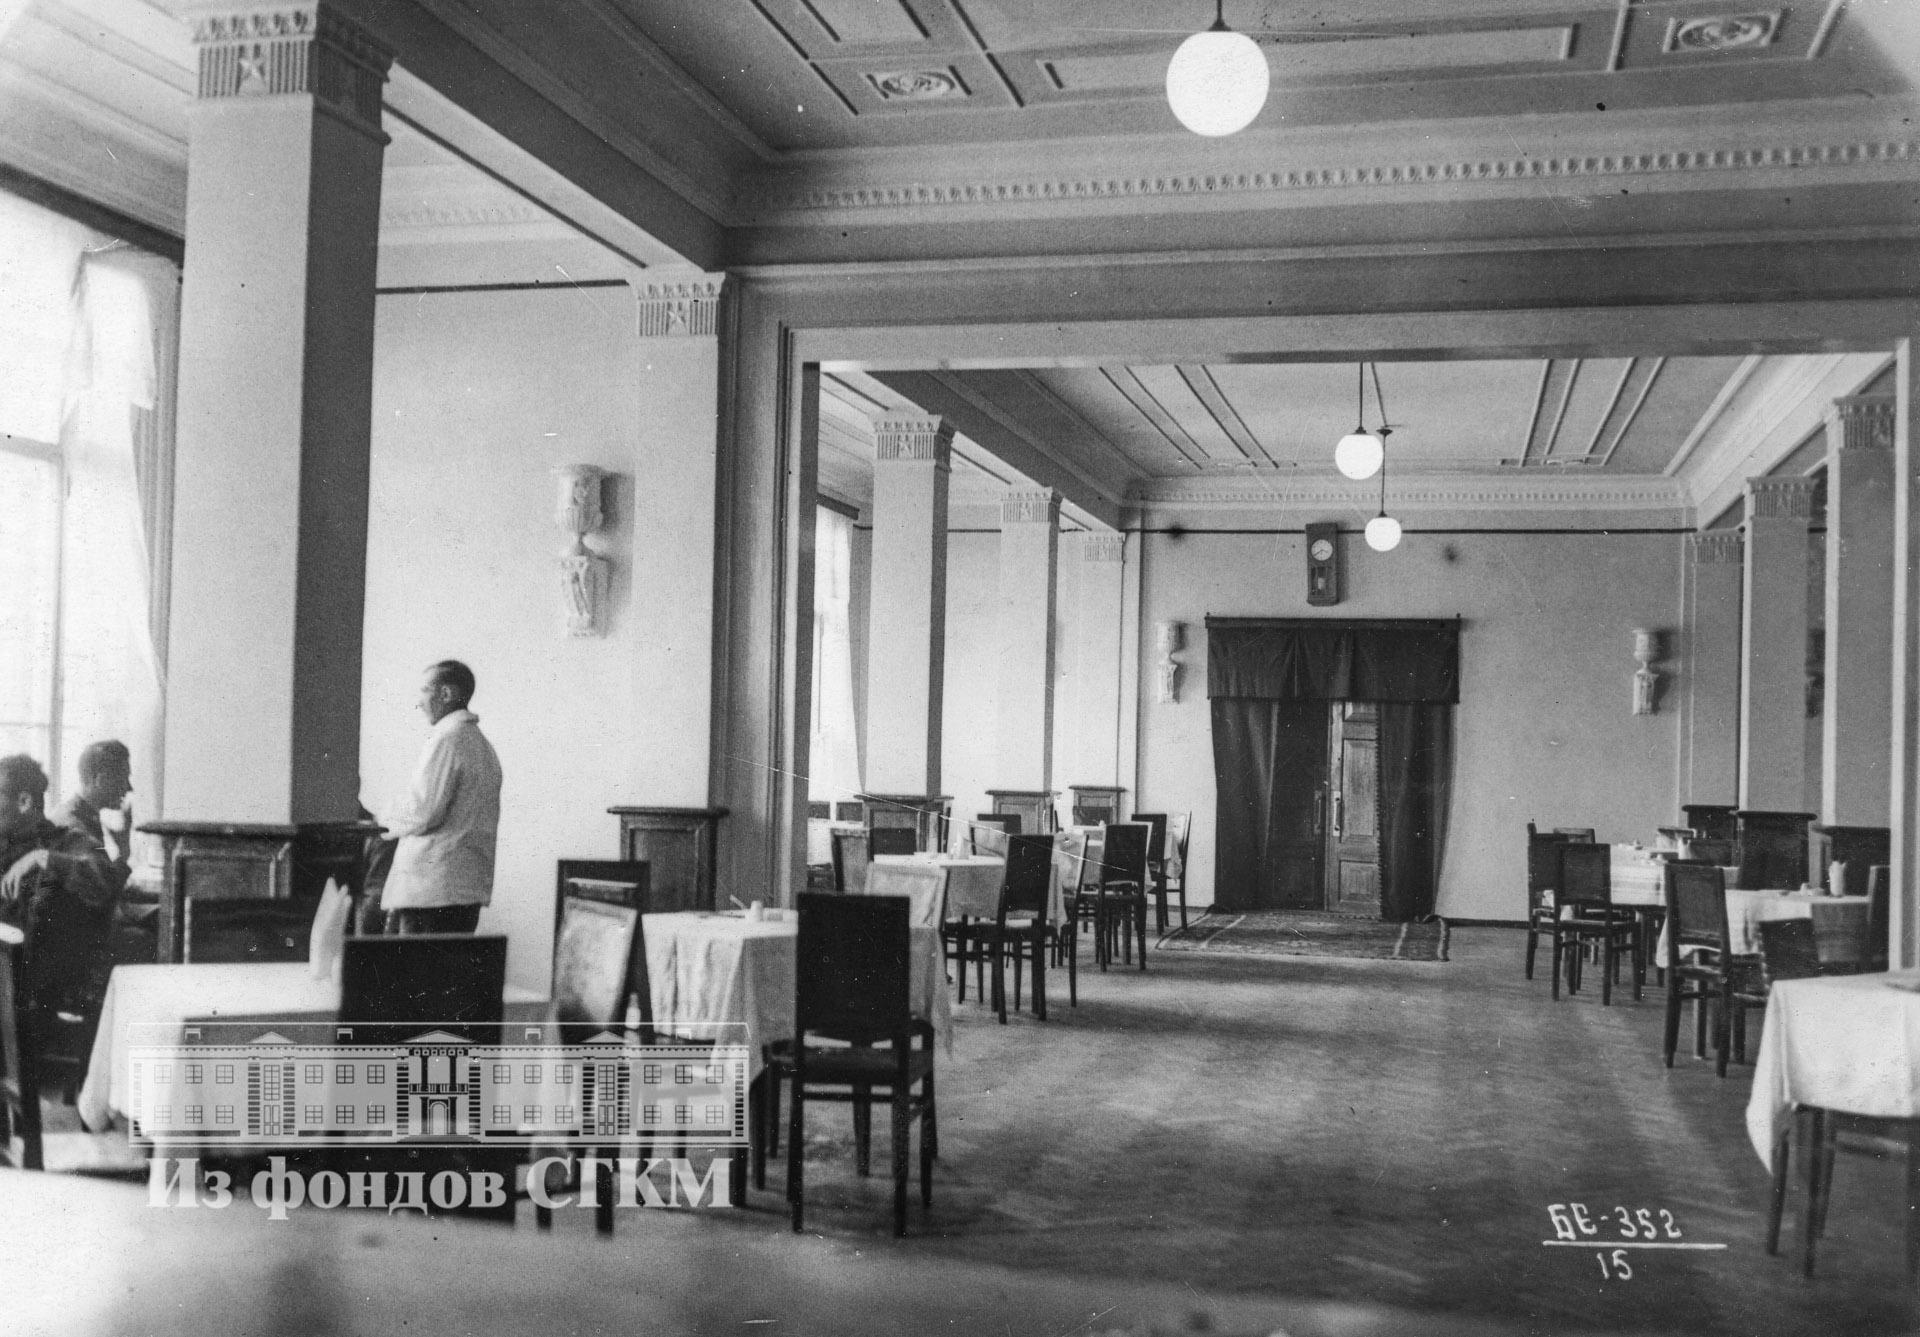 1939. Внутренний вид столовой